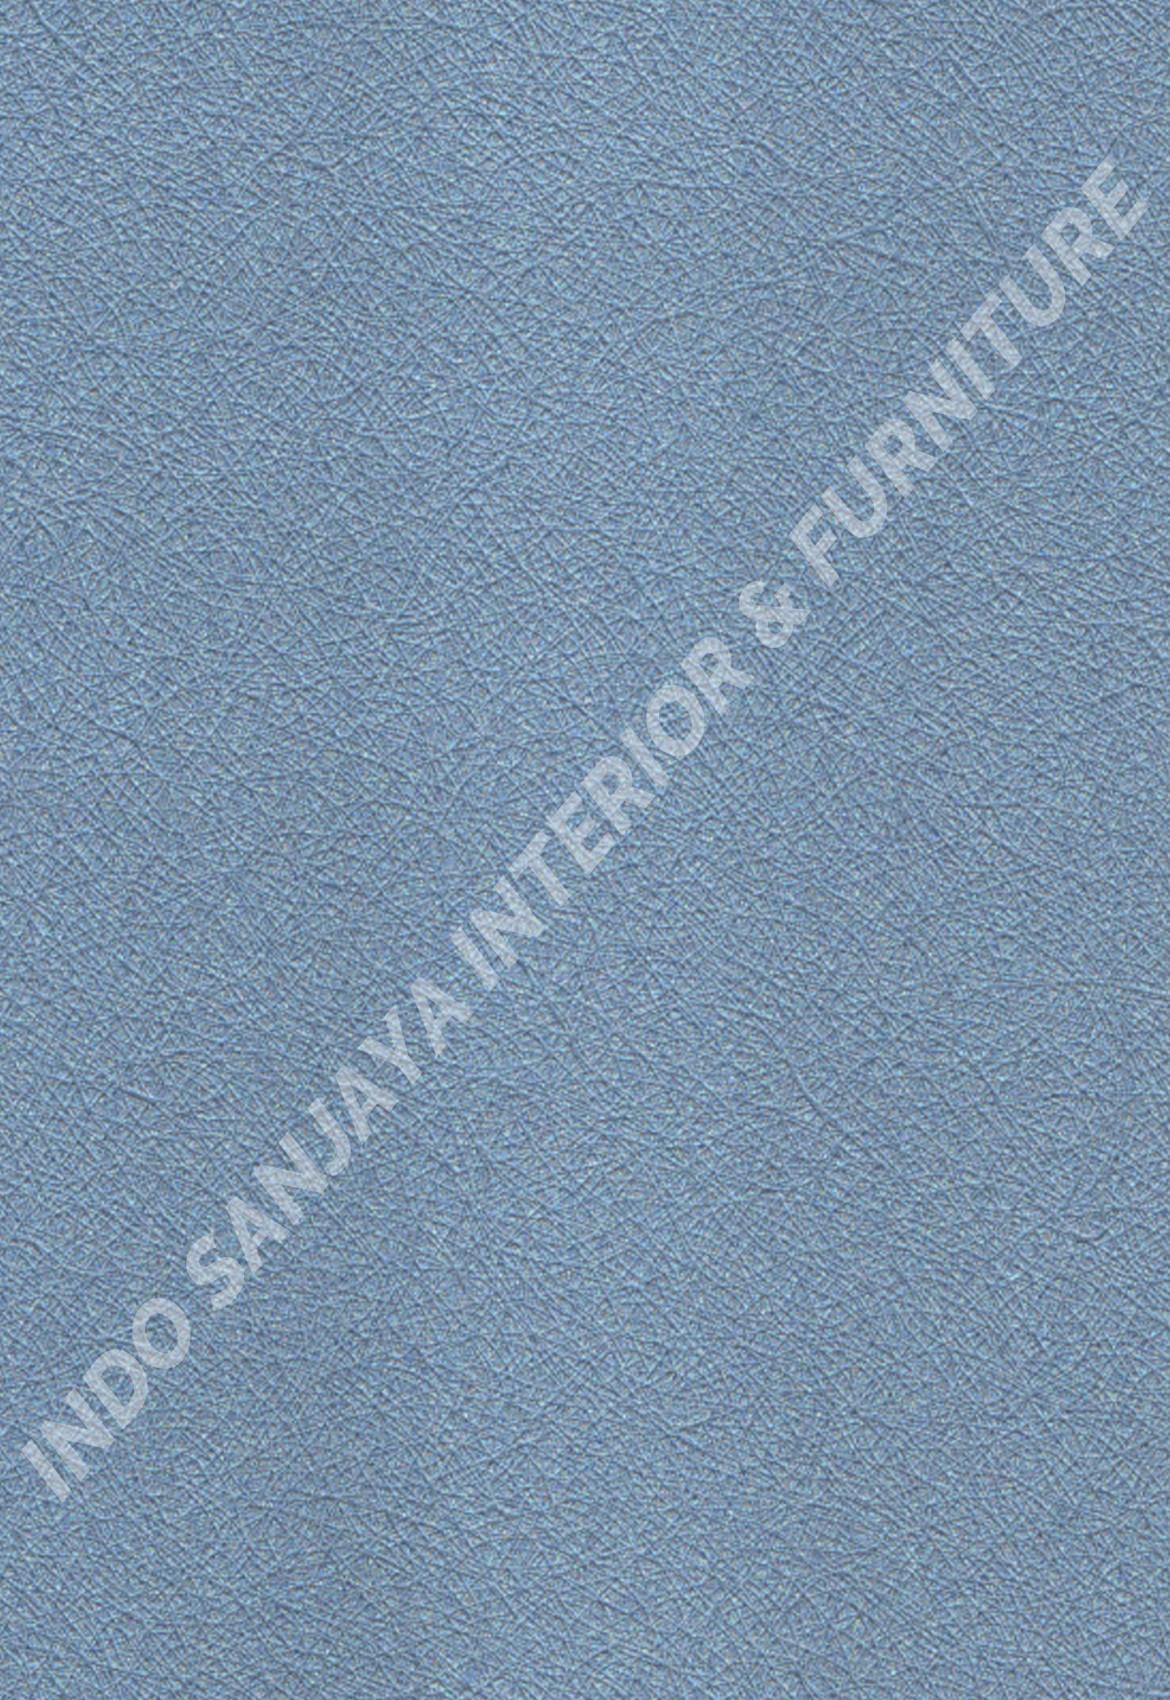 wallpaper   Wallpaper Minimalis Polos 83129-3:83129-3 corak  warna